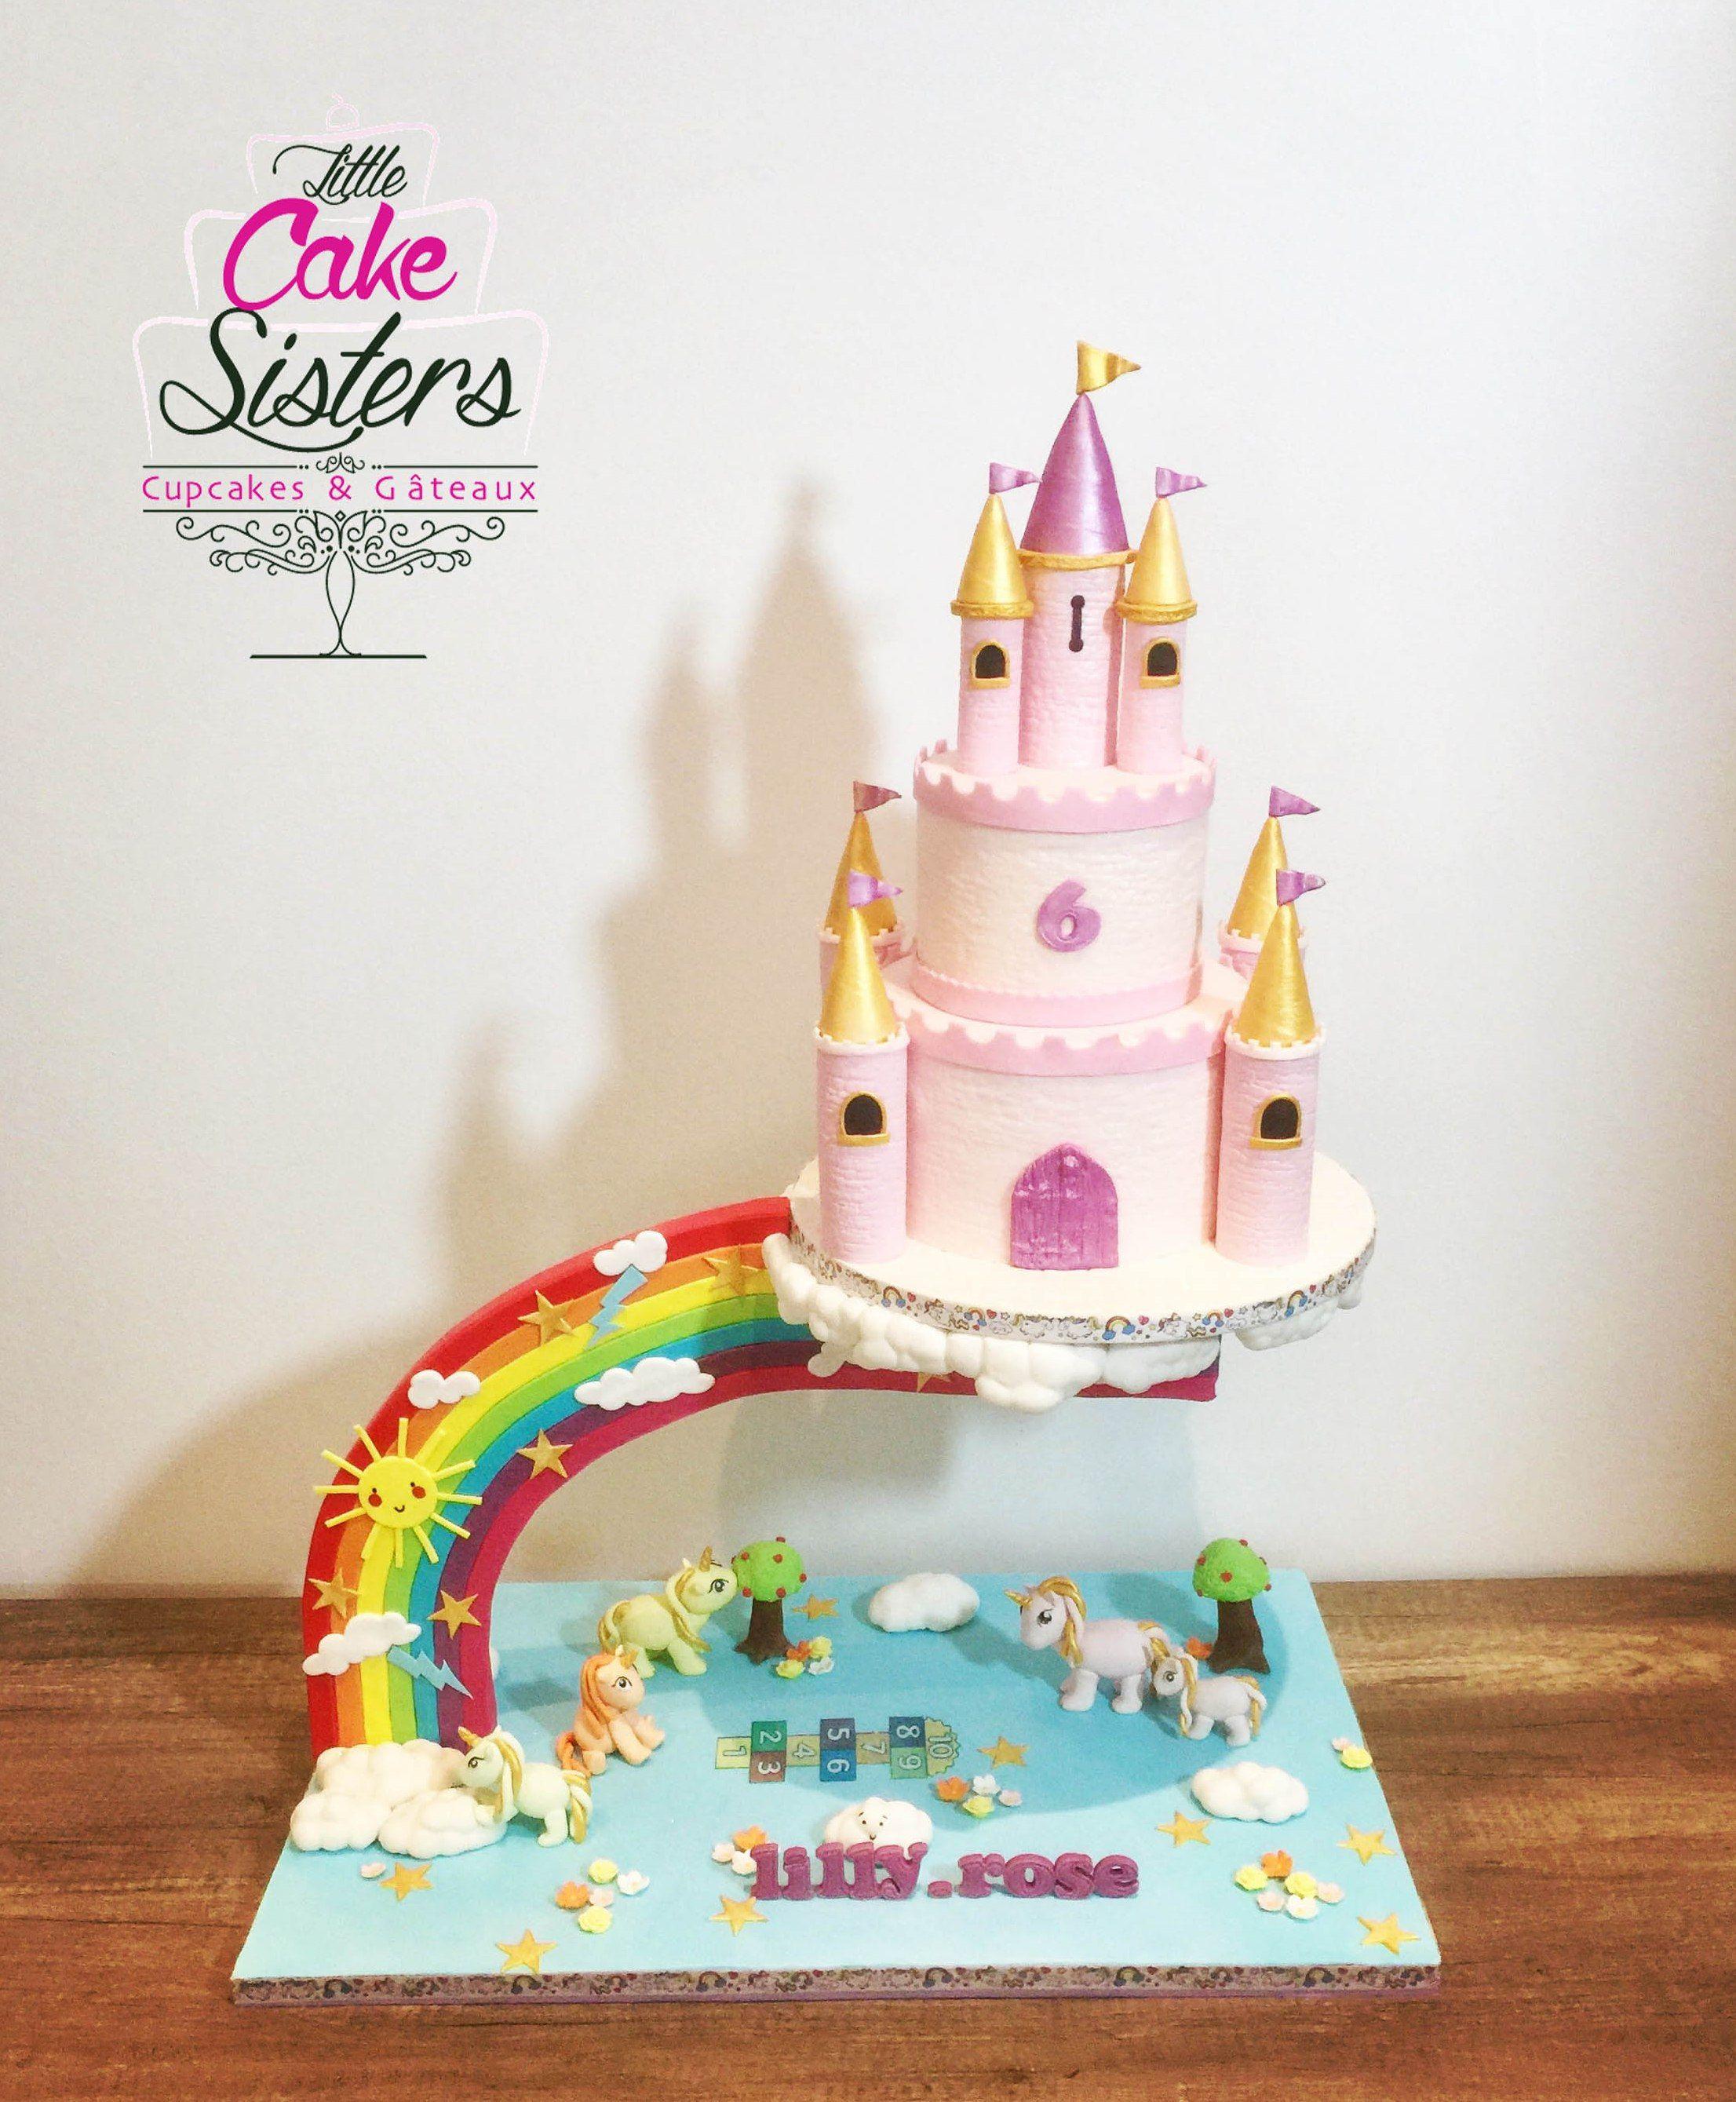 Gravity Cake Chateau Gateau Licrone Princesse Chateau Arc En Ciel Castle Cake Unicorn Rai Gateau De Princesse Gateau Princesse Disney Anniversaire Kawaii